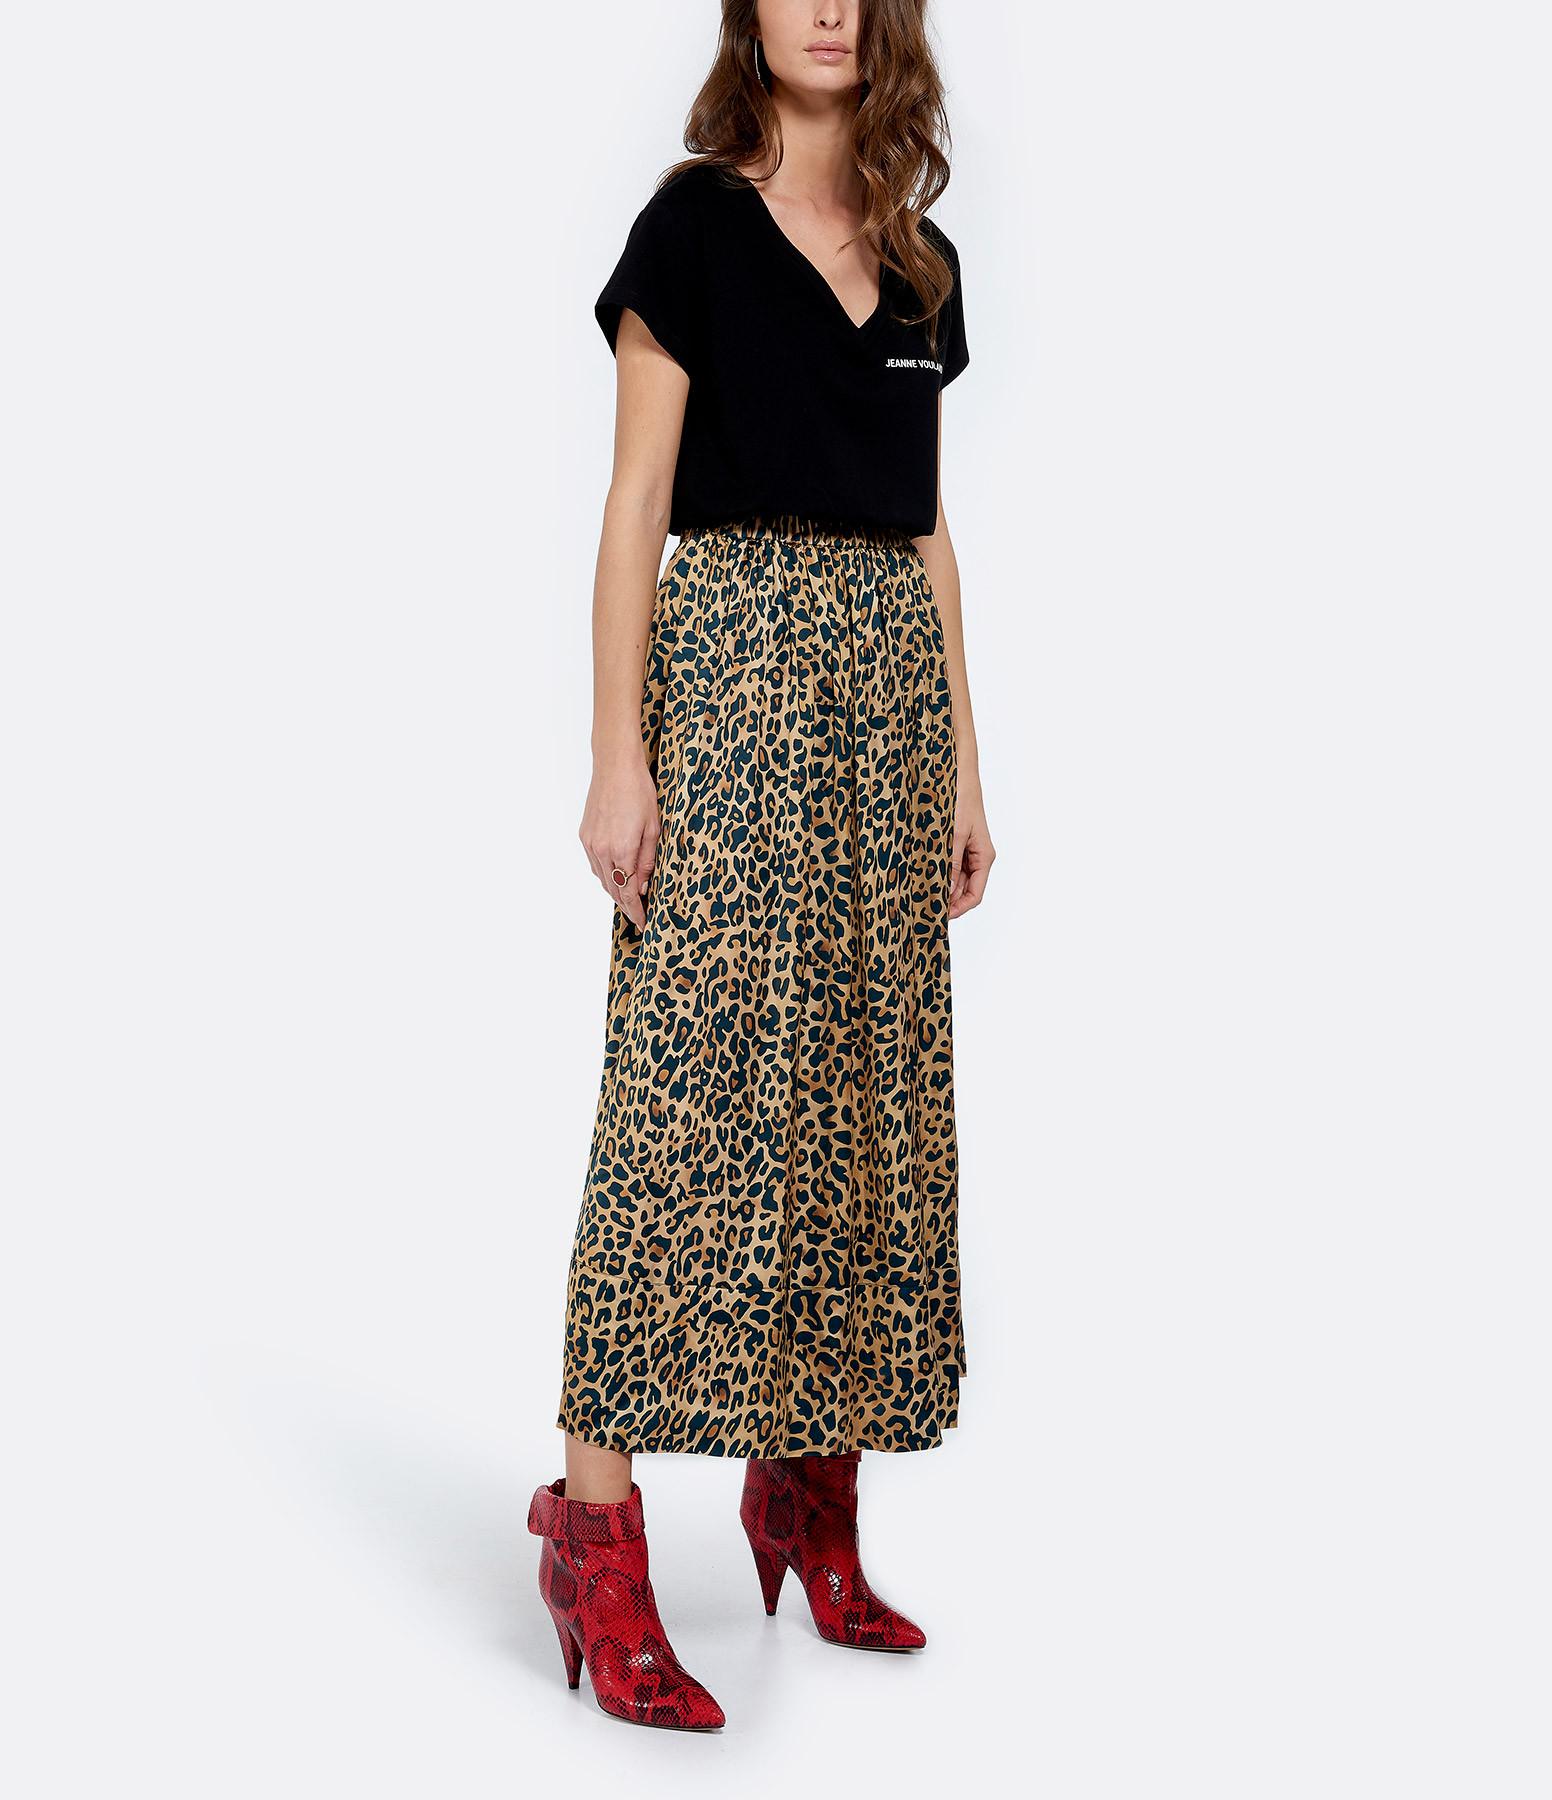 JEANNE VOULAND - Tee-shirt Aria JV Col V Noir Imprimé Blanc